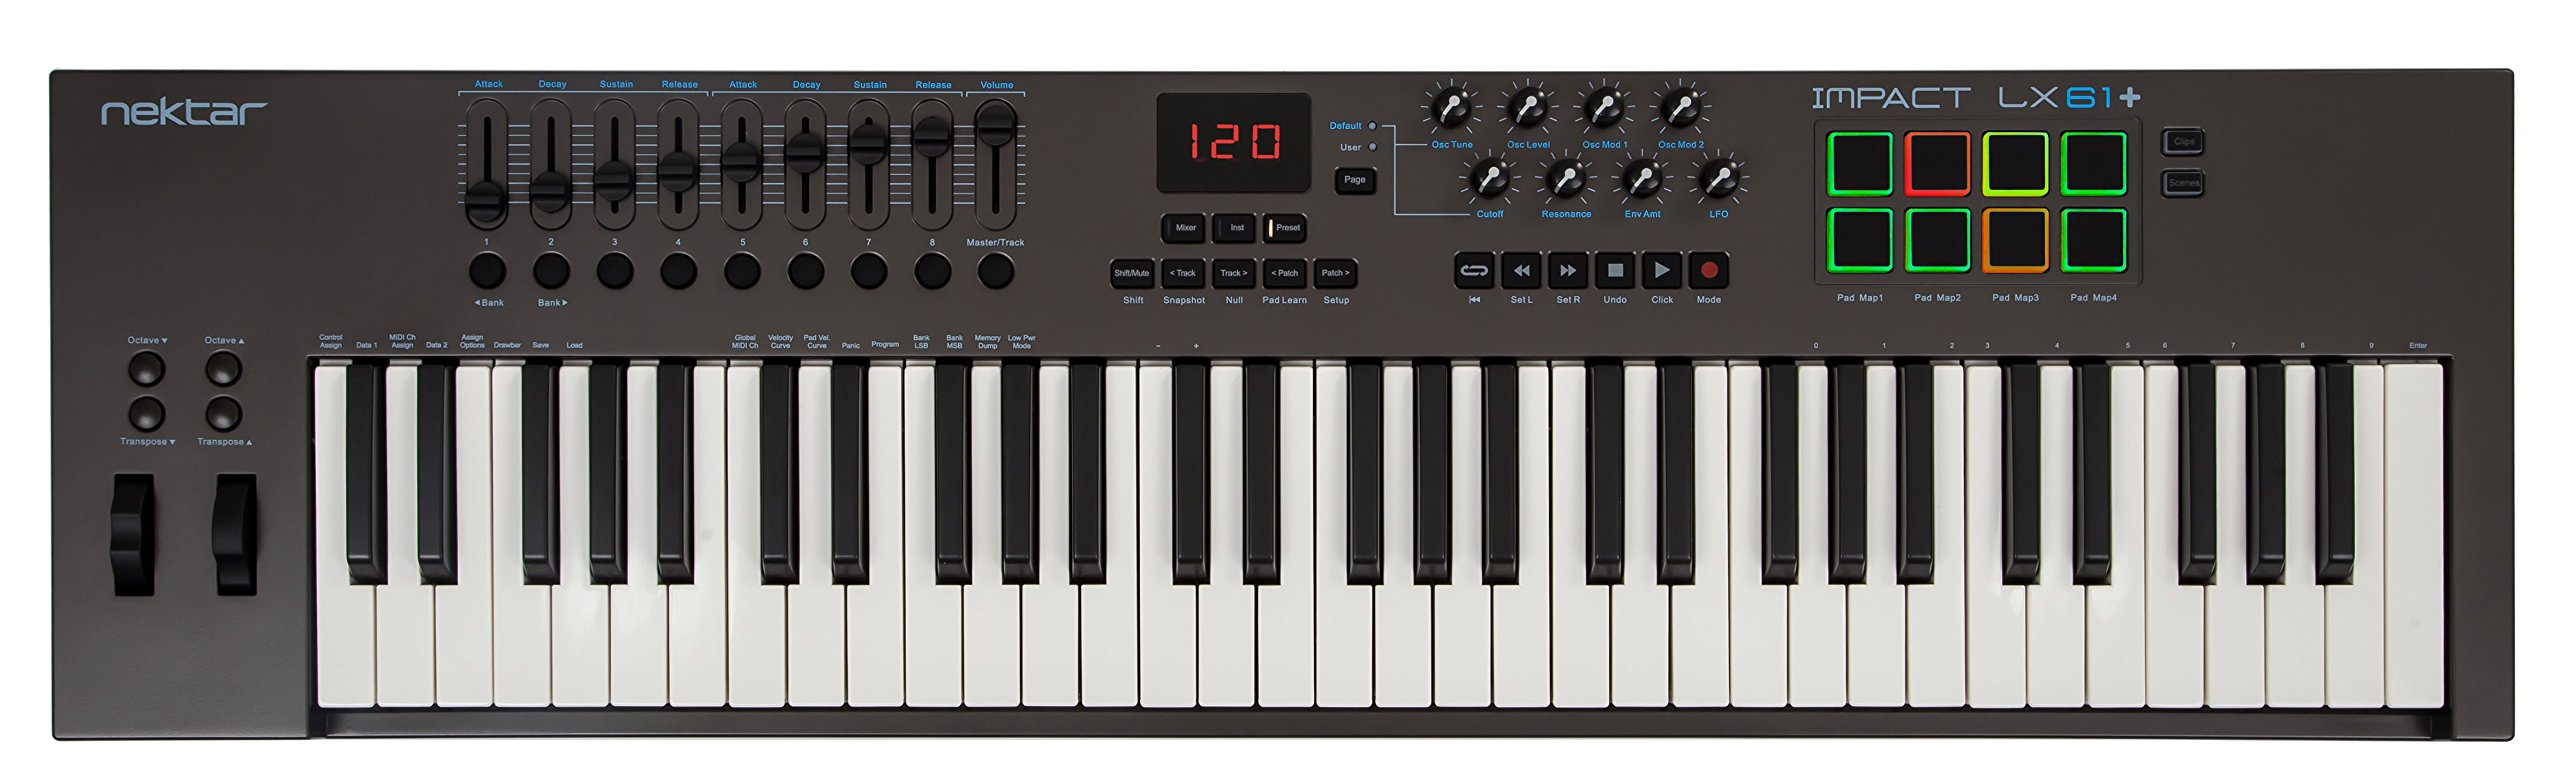 Nektar Impact LX61+ Keyboard Controller by Nektar